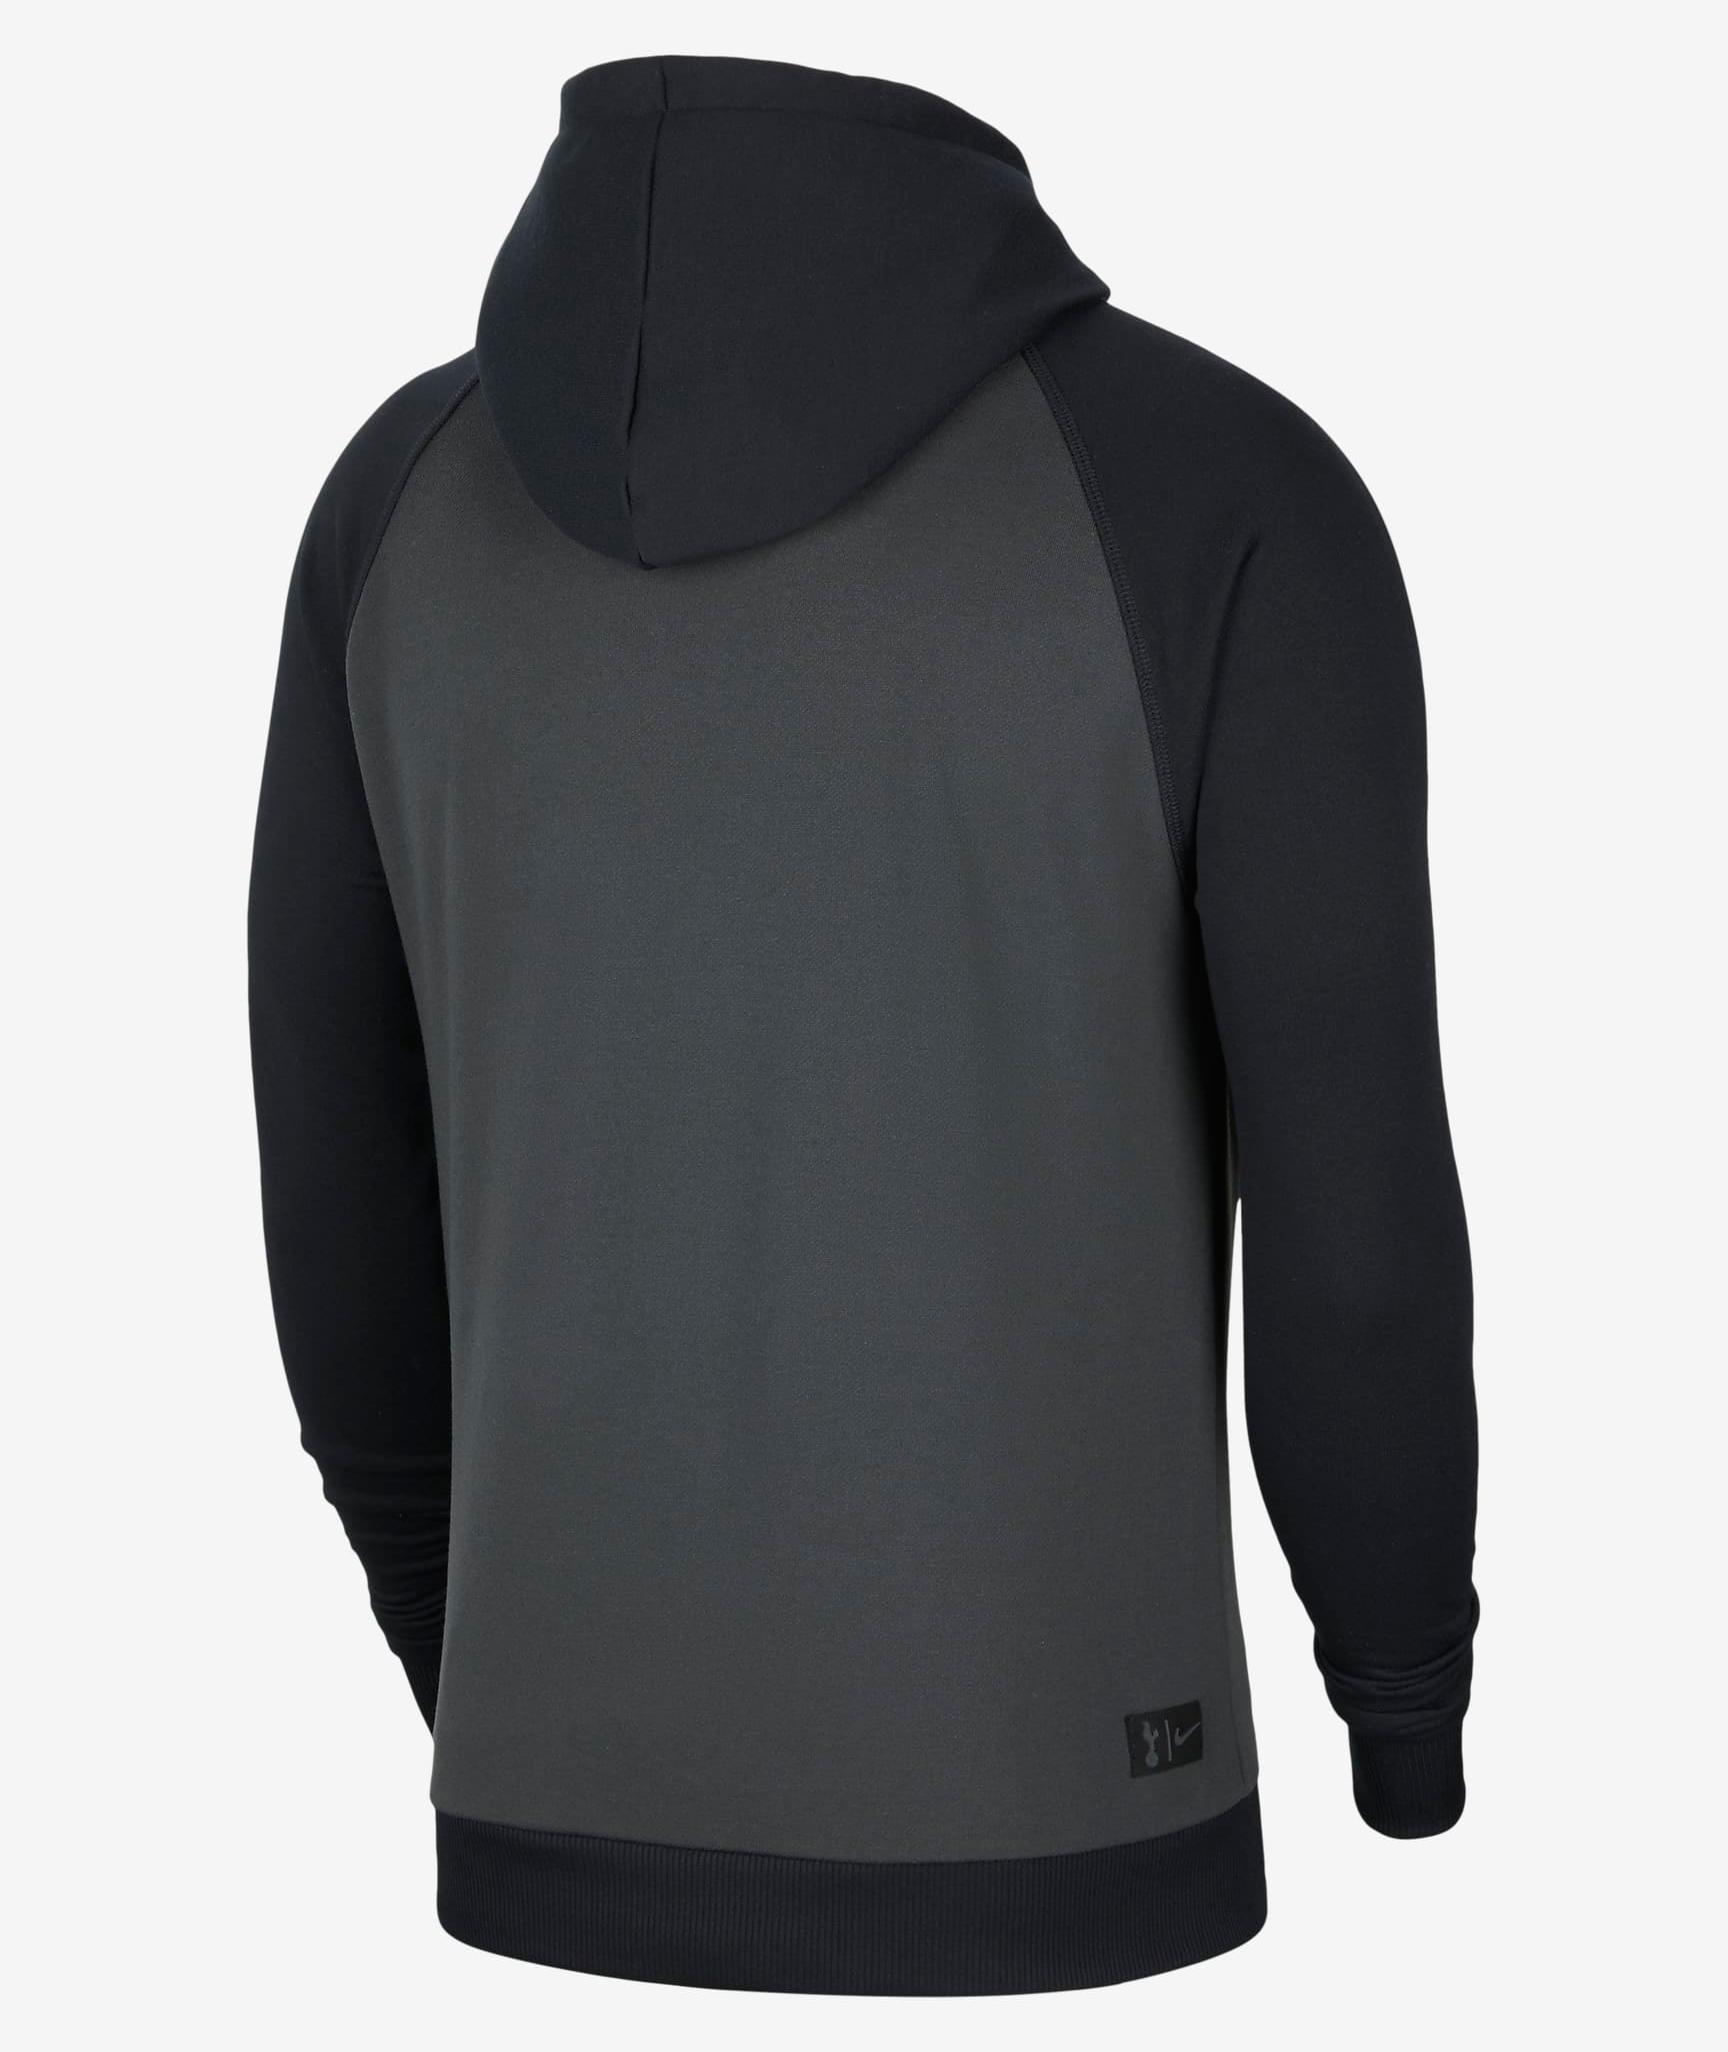 nike-tottenham-hotspur-air-max-95-hoodie-2